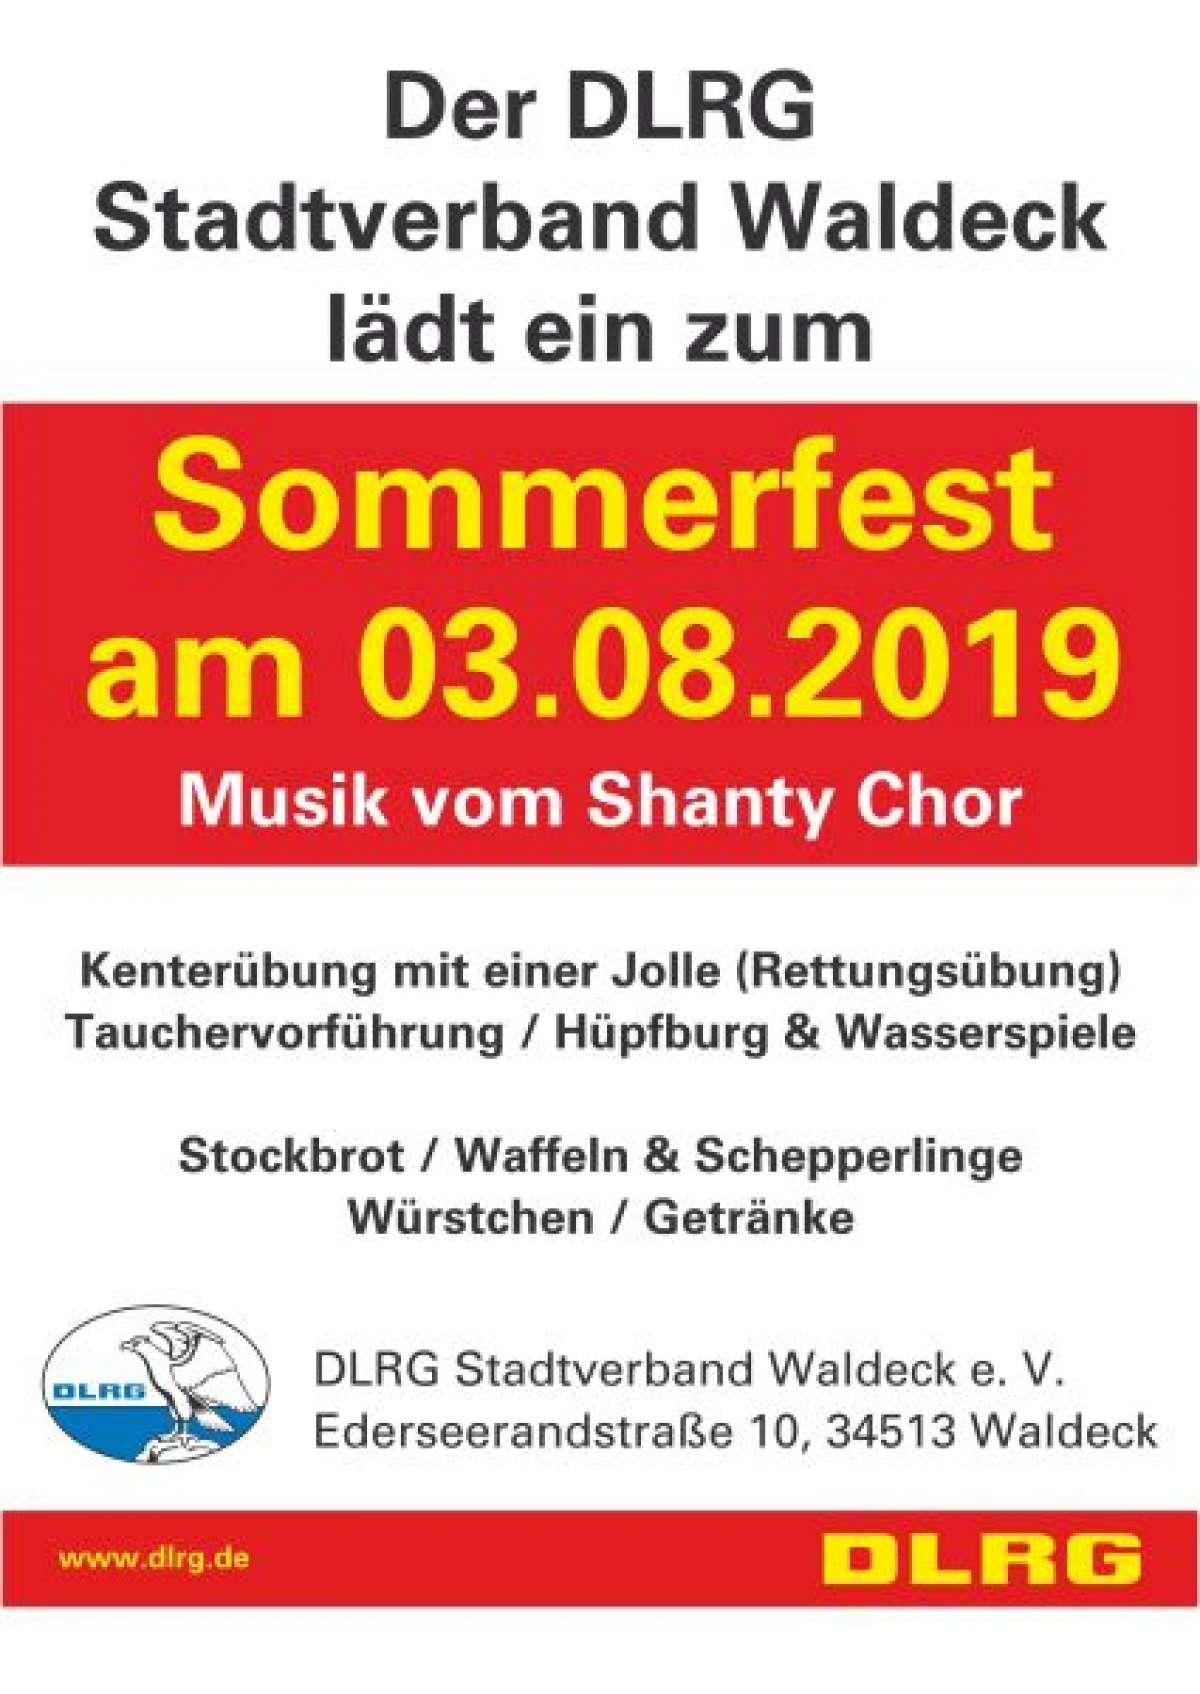 Sommerfest - Shanty Chor - DLRG Stadtverband  - Waldeck